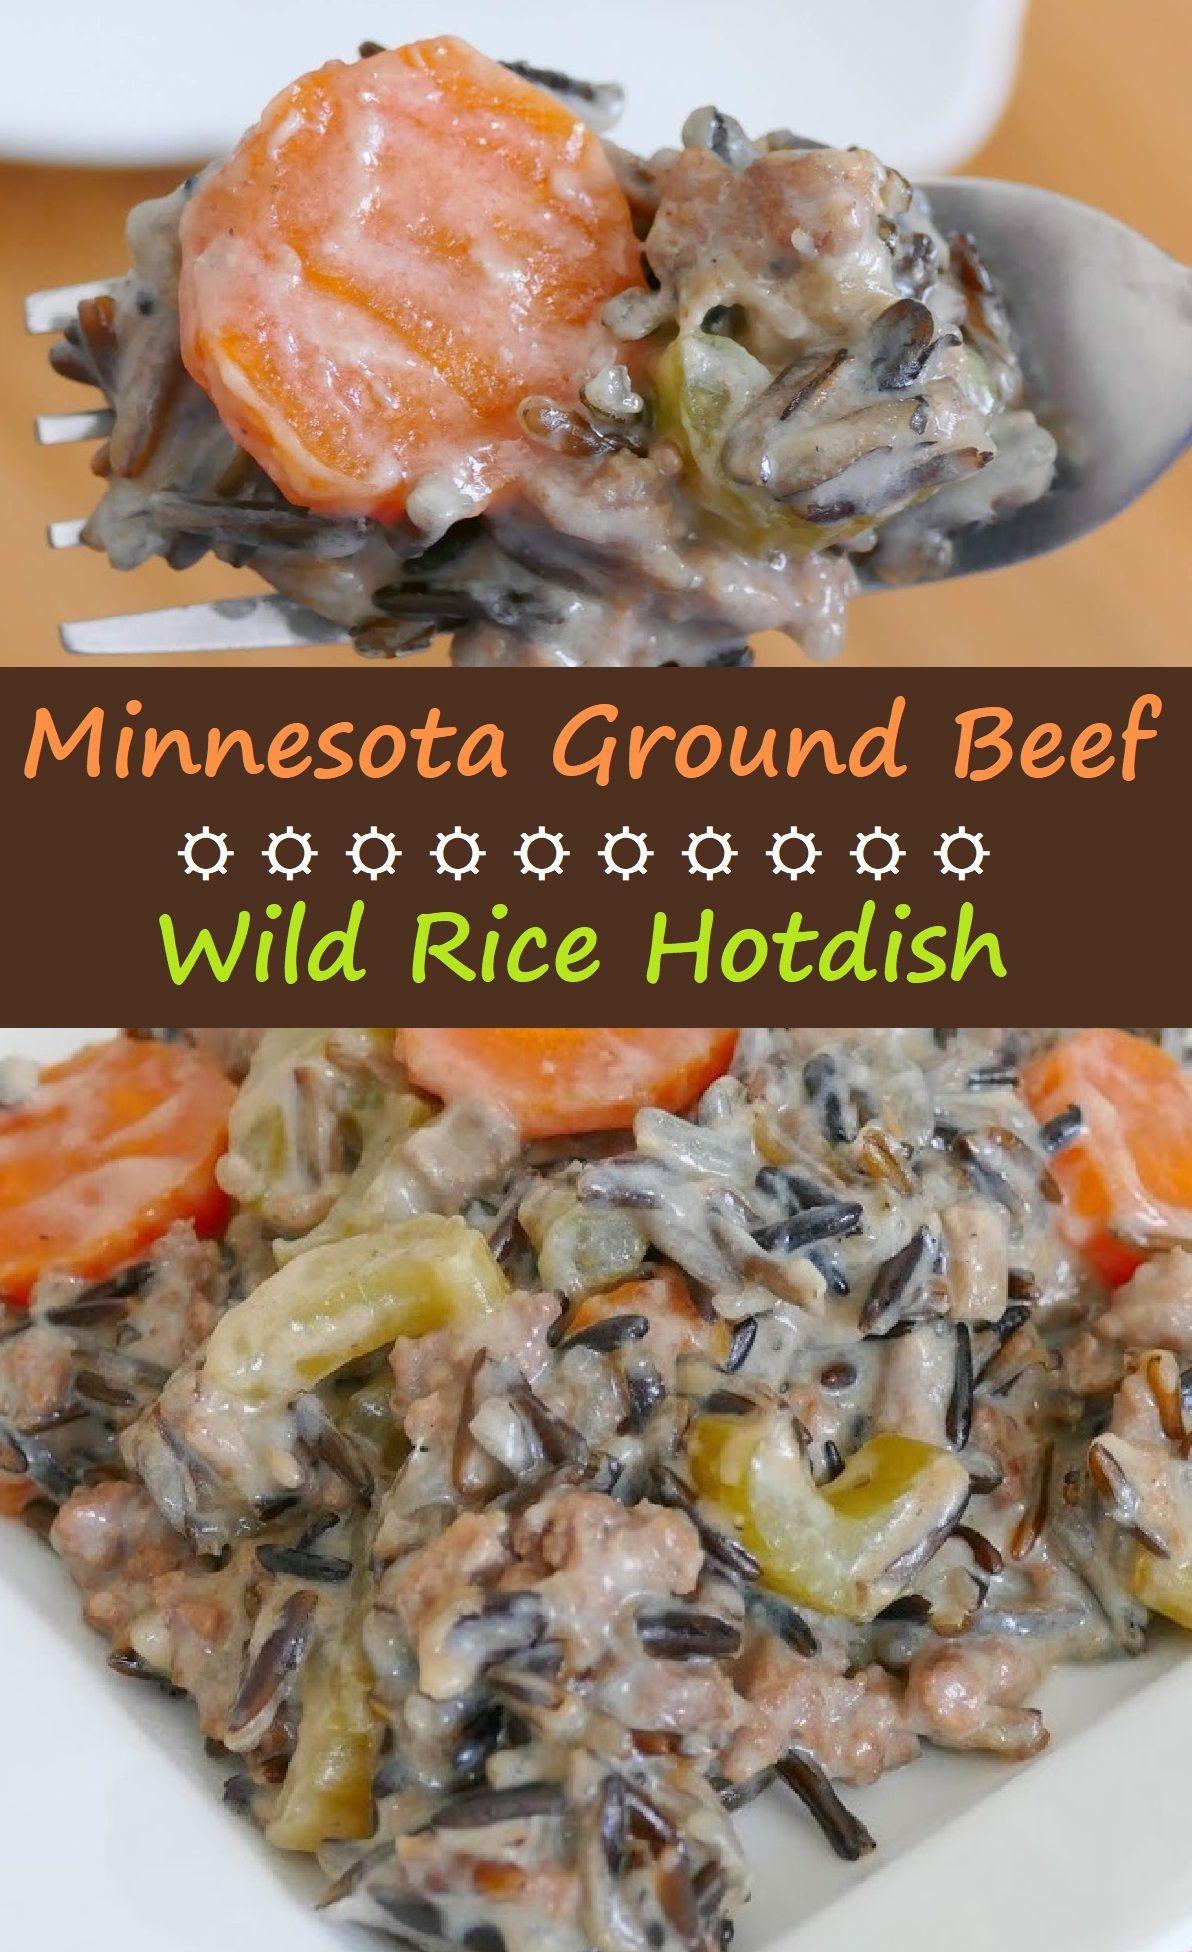 Minnesota Ground Beef And Wild Rice Hotdish Beefstroganof Beefstew In 2020 Crockpot Recipes Beef Stew Pork Dinner Venison Recipes